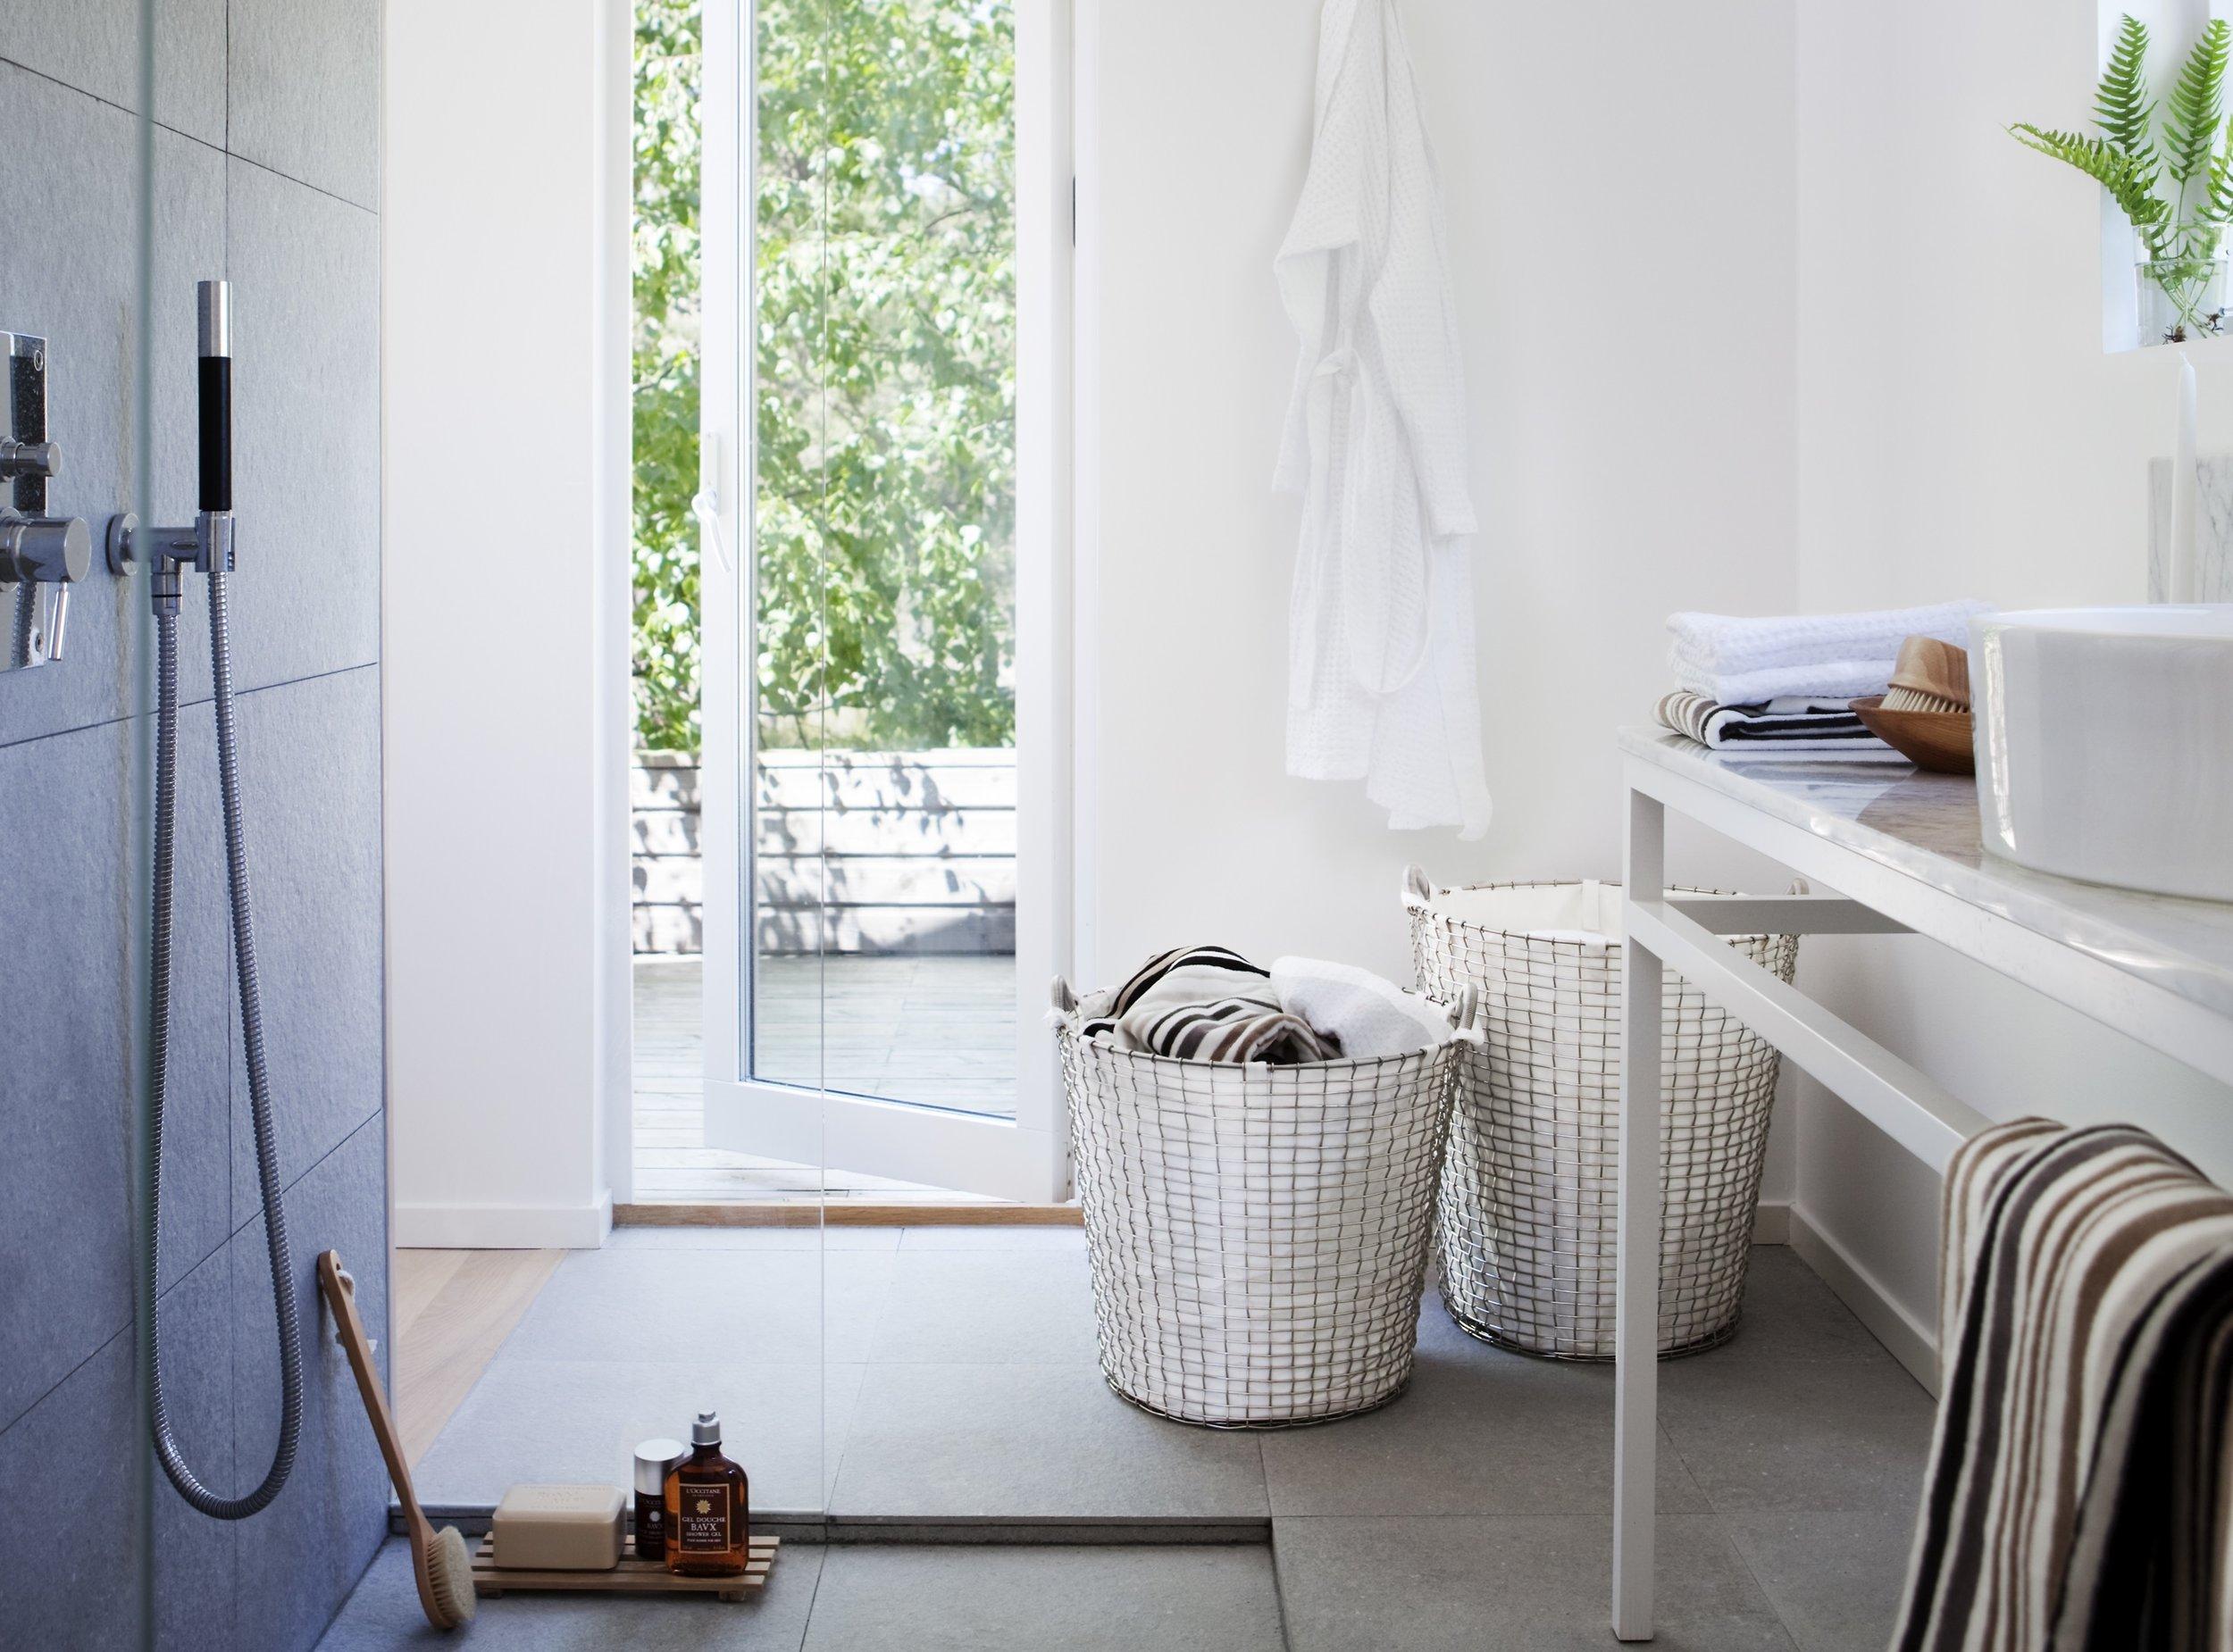 Classic 80 & 65, laundry bag - Bathroom.jpg